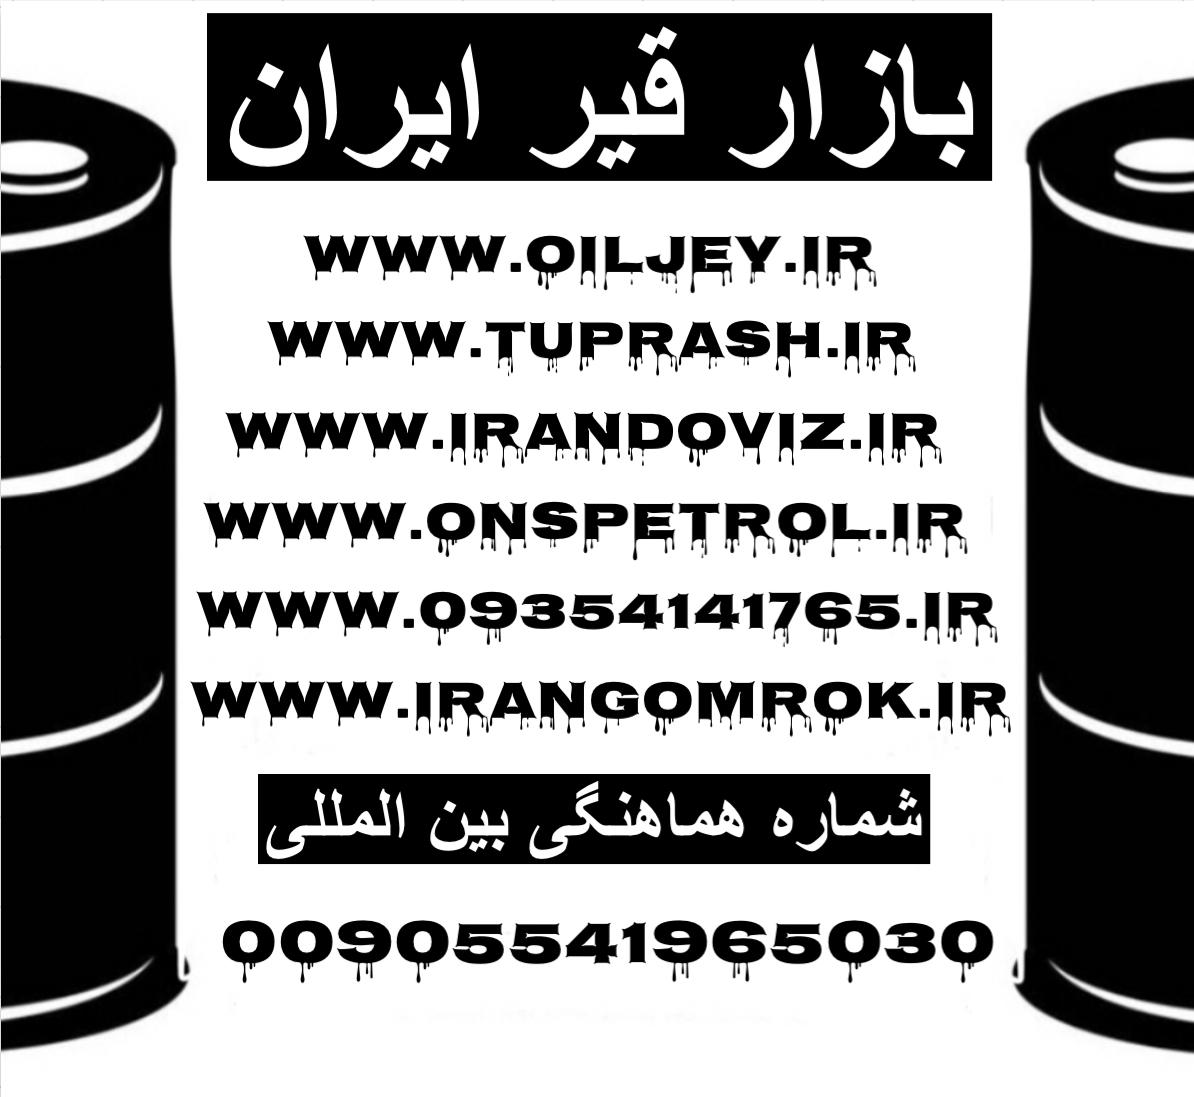 تصویر : https://rozup.ir/view/2923411/ABD83693-5564-4FAB-8FF4-93D553FBA17A.jpeg